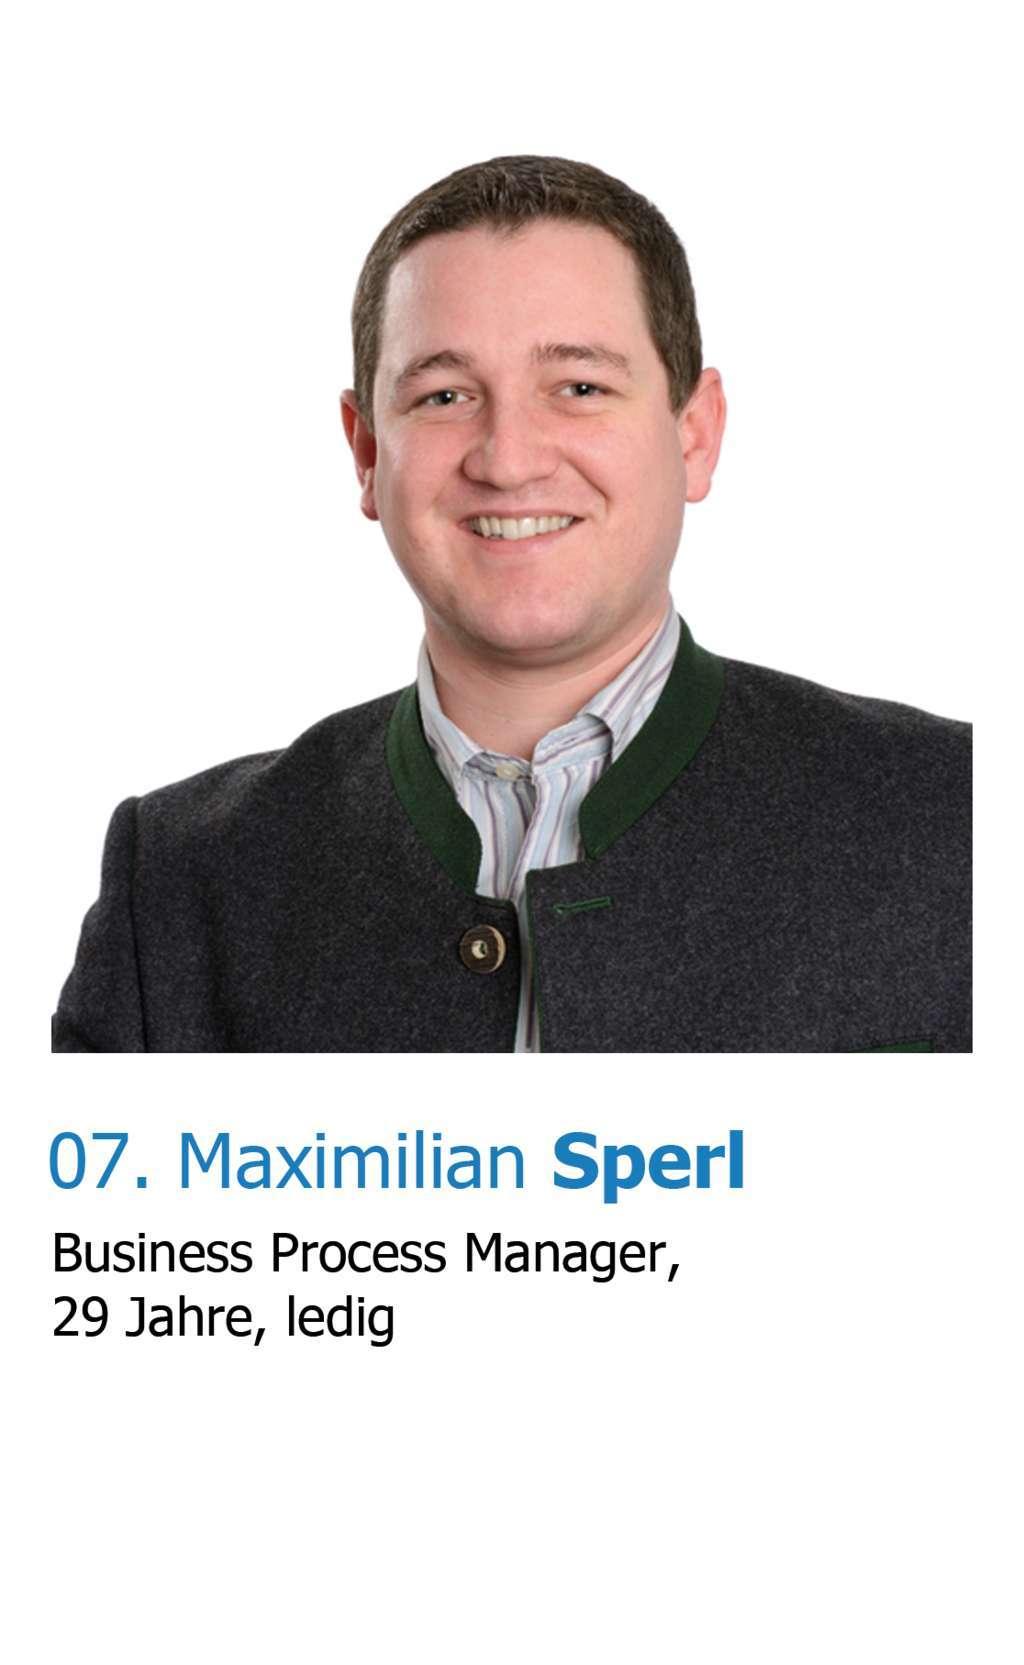 Maximilian Sperl